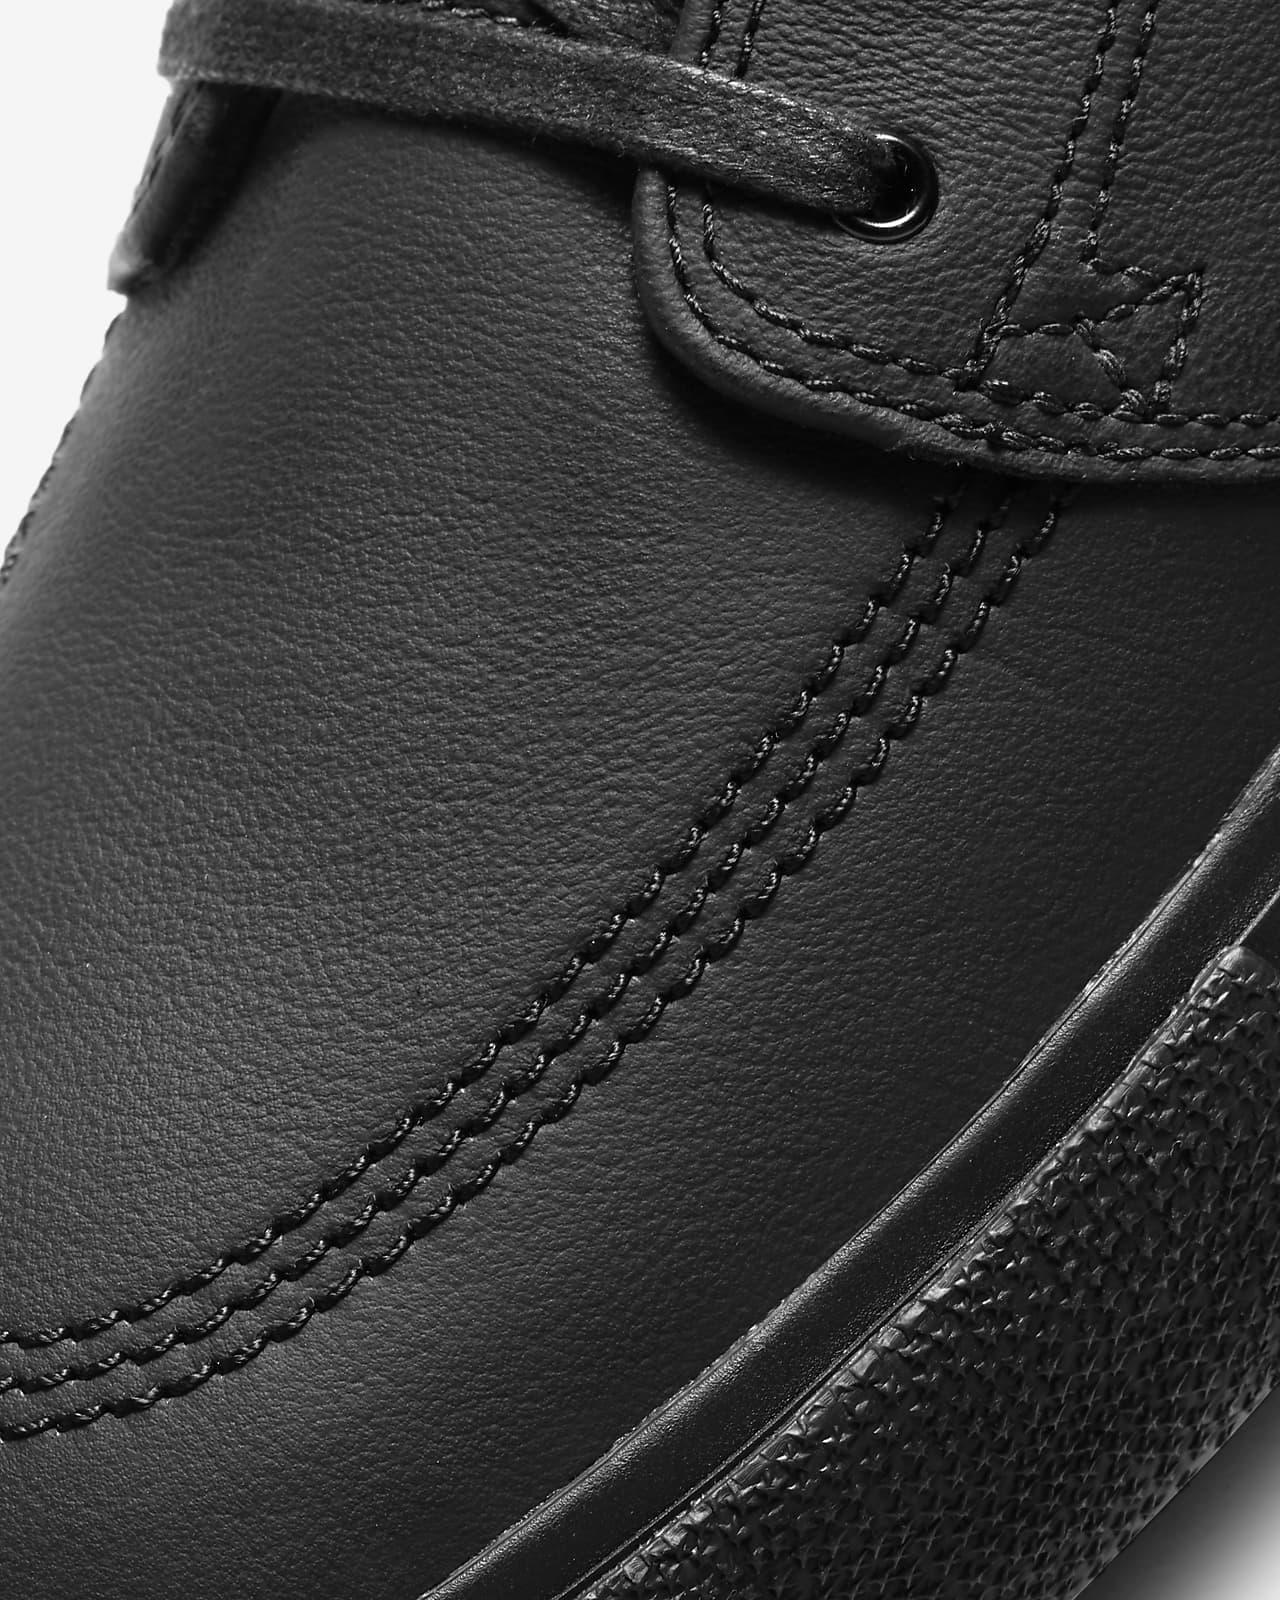 Vicio Serena poetas  Nike SB Zoom Stefan Janoski RM Premium Skate Shoe. Nike SA